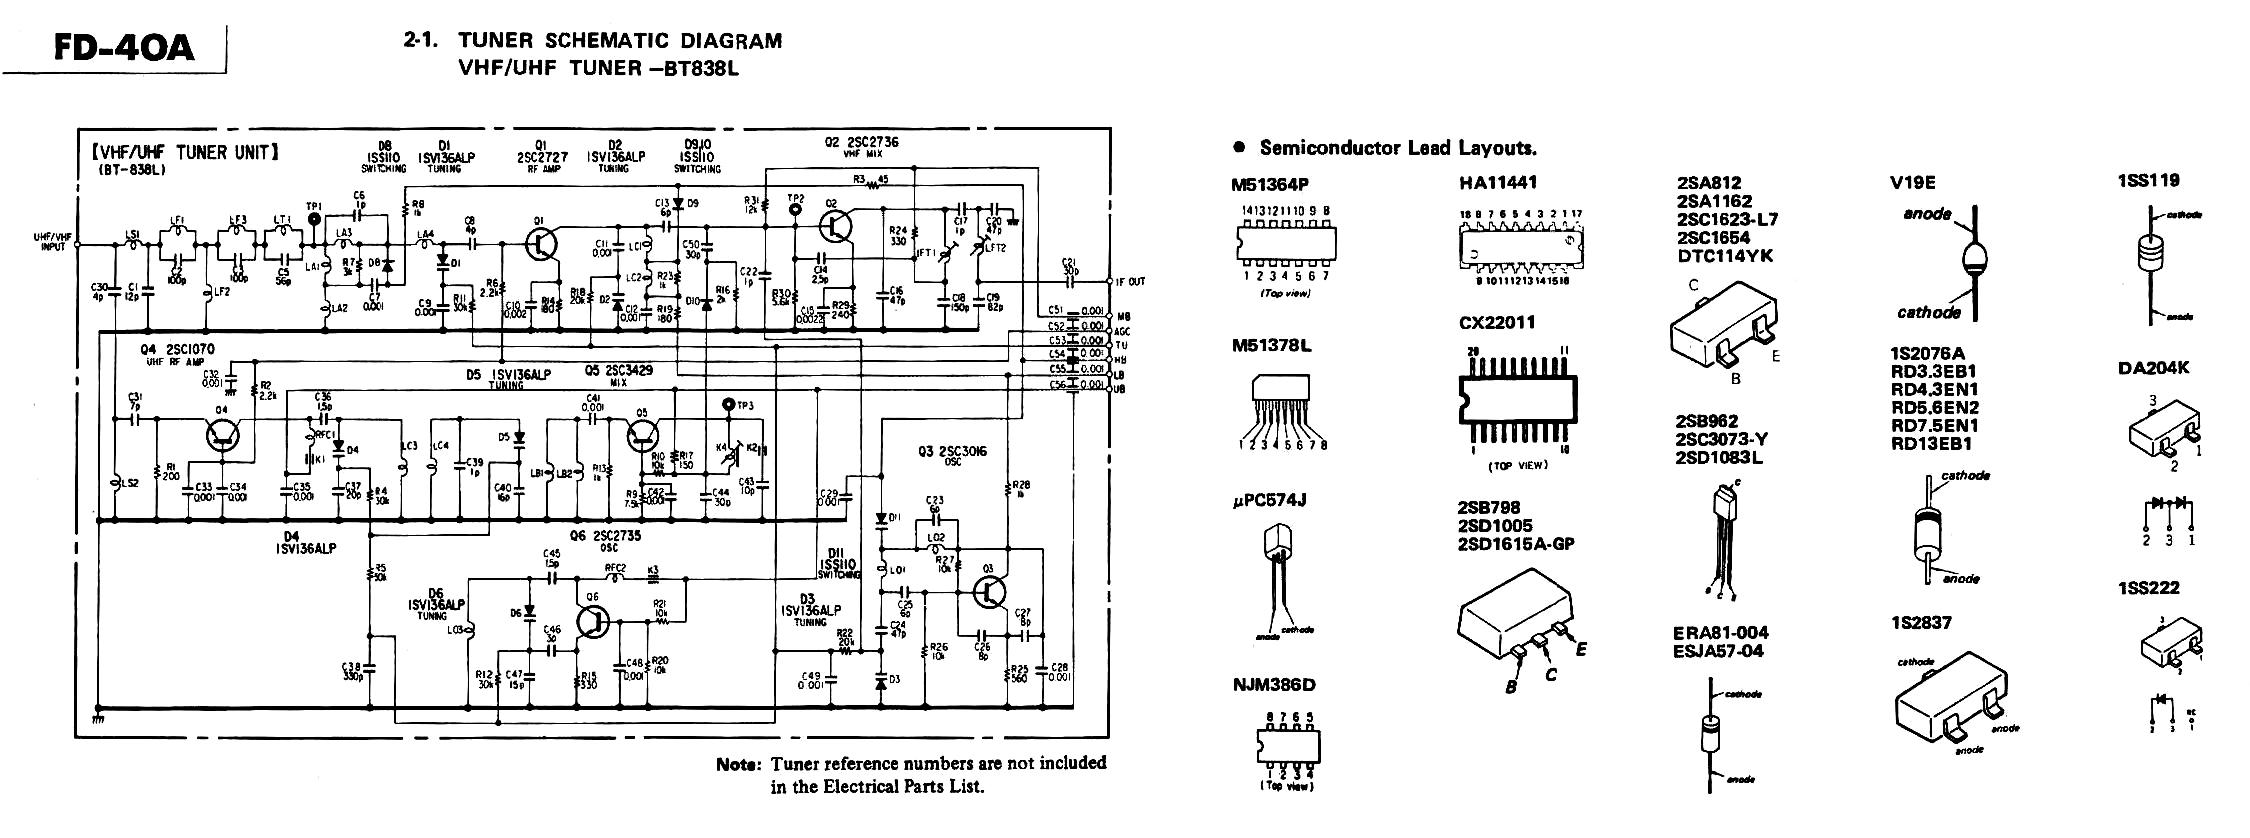 Uhf Tv Tuner Schematic Homebrew Antenna Wire Diagrams Block Diagram Of Receiver Vintage Technics Sony Watchman Fd 40a